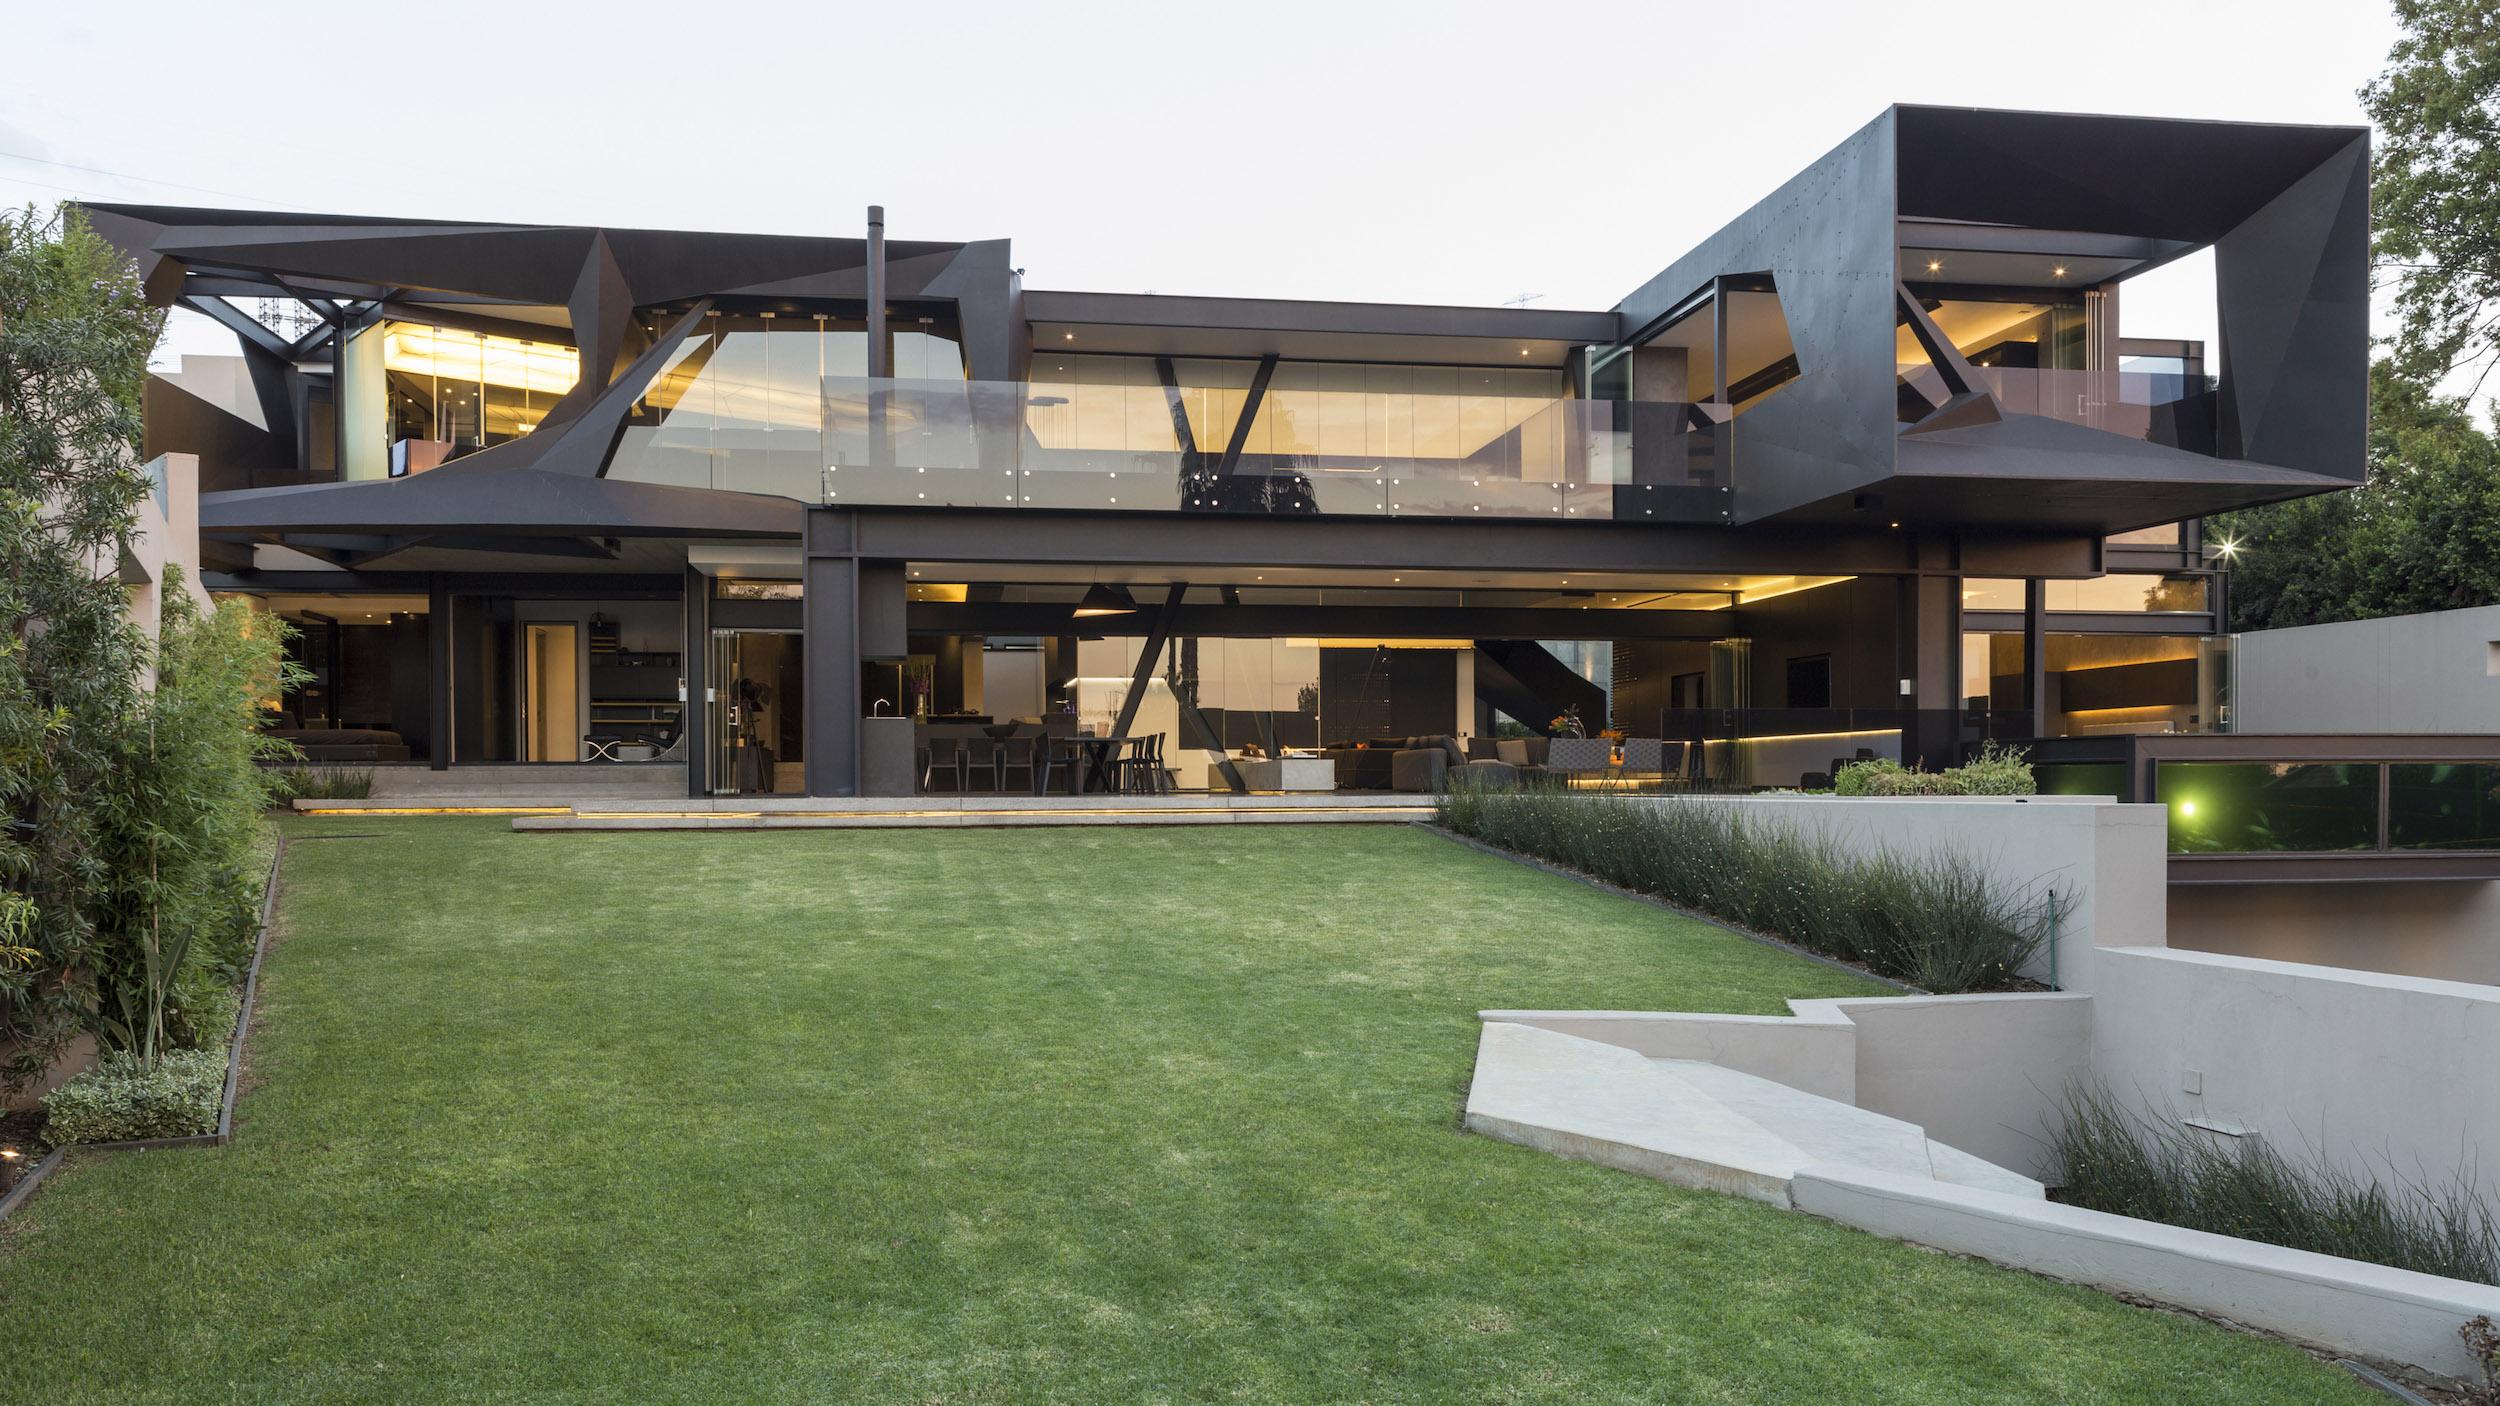 Kloof Road Masterpiece House in Johannesburg by Nico van der Meulen Architects-08